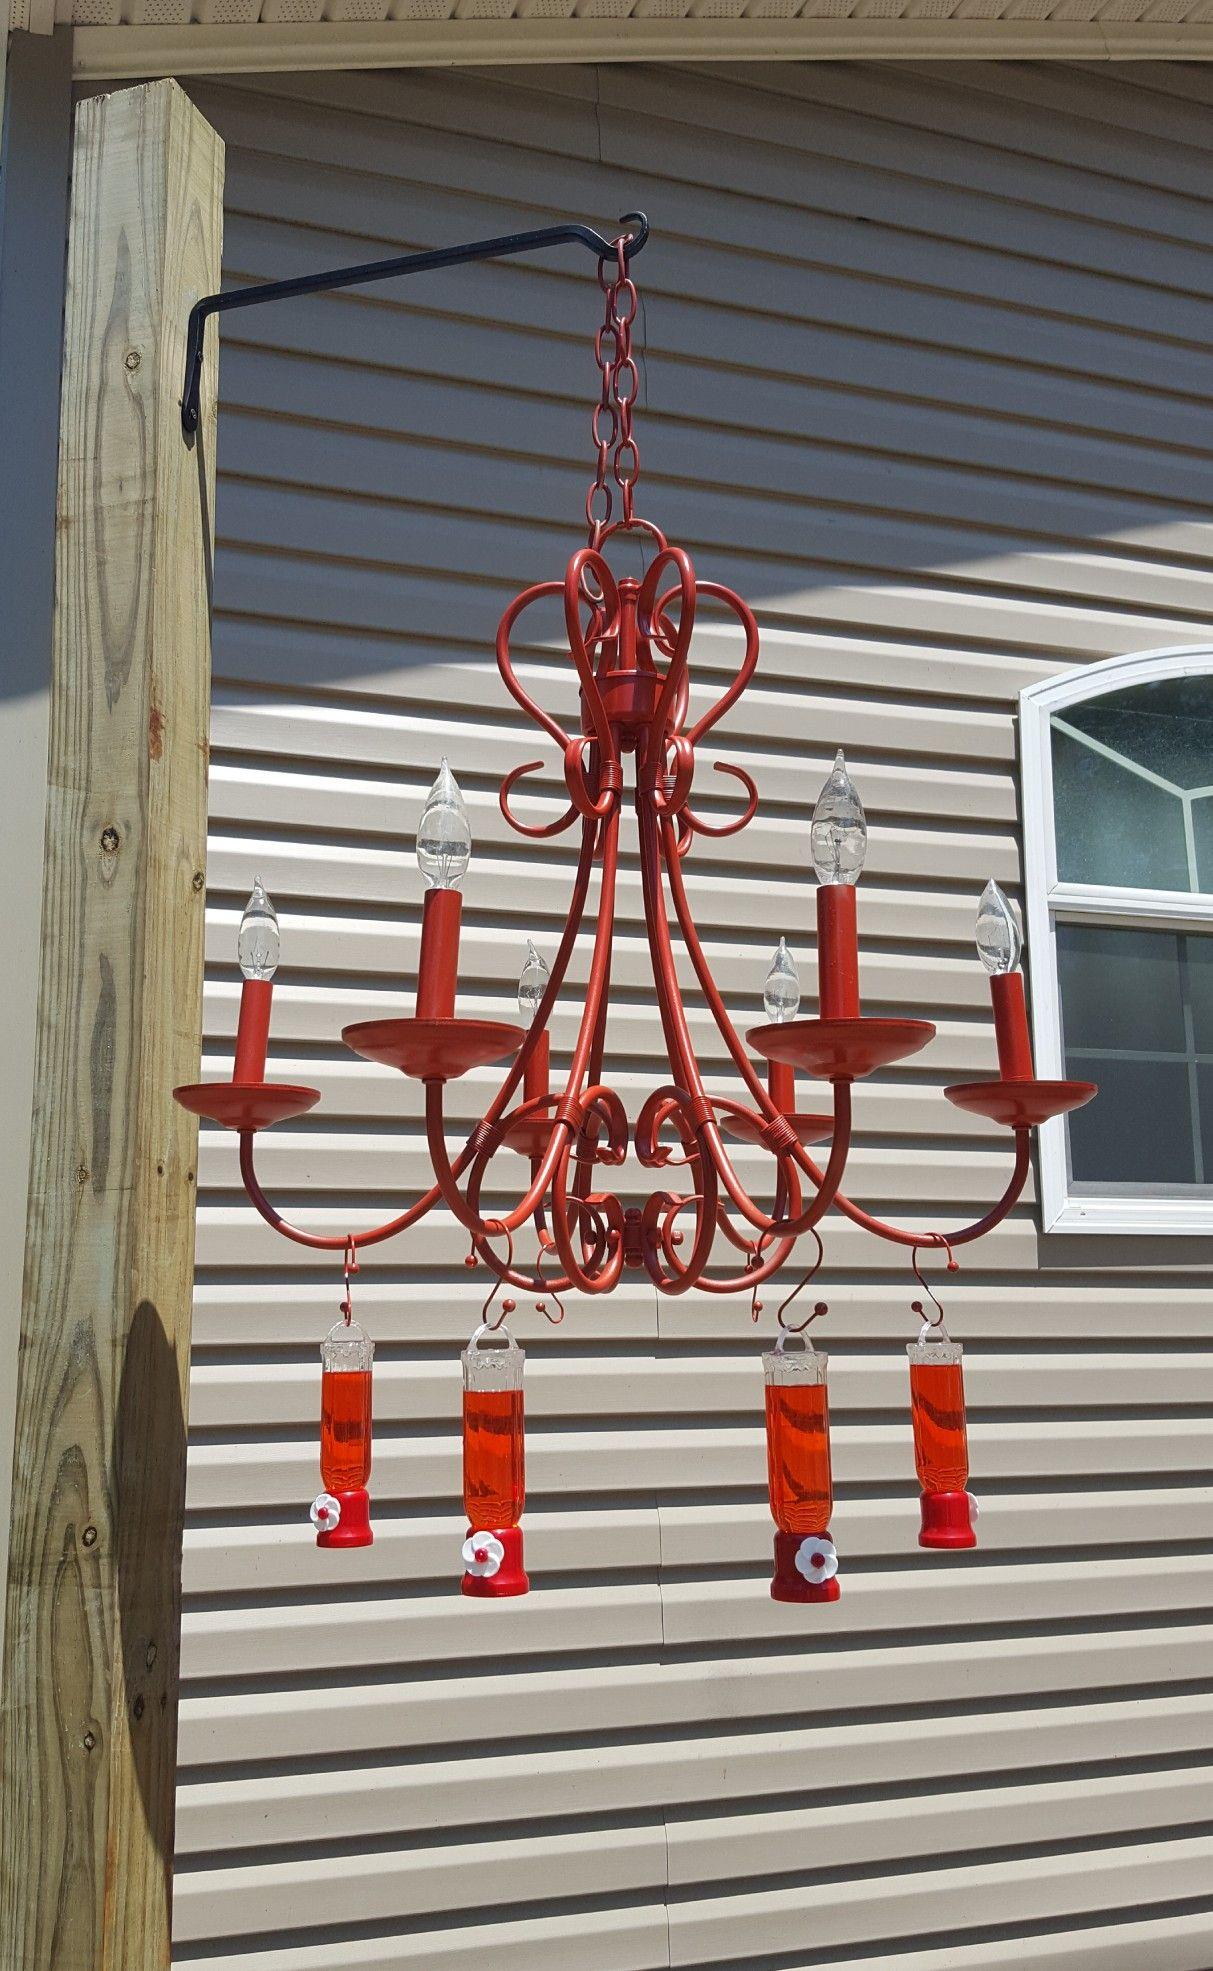 Hummingbird Feeder Chandelier Hummingbird Feeder Refurbished Chandelier Humming Bird Feeders Trending Decor House Architecture Design